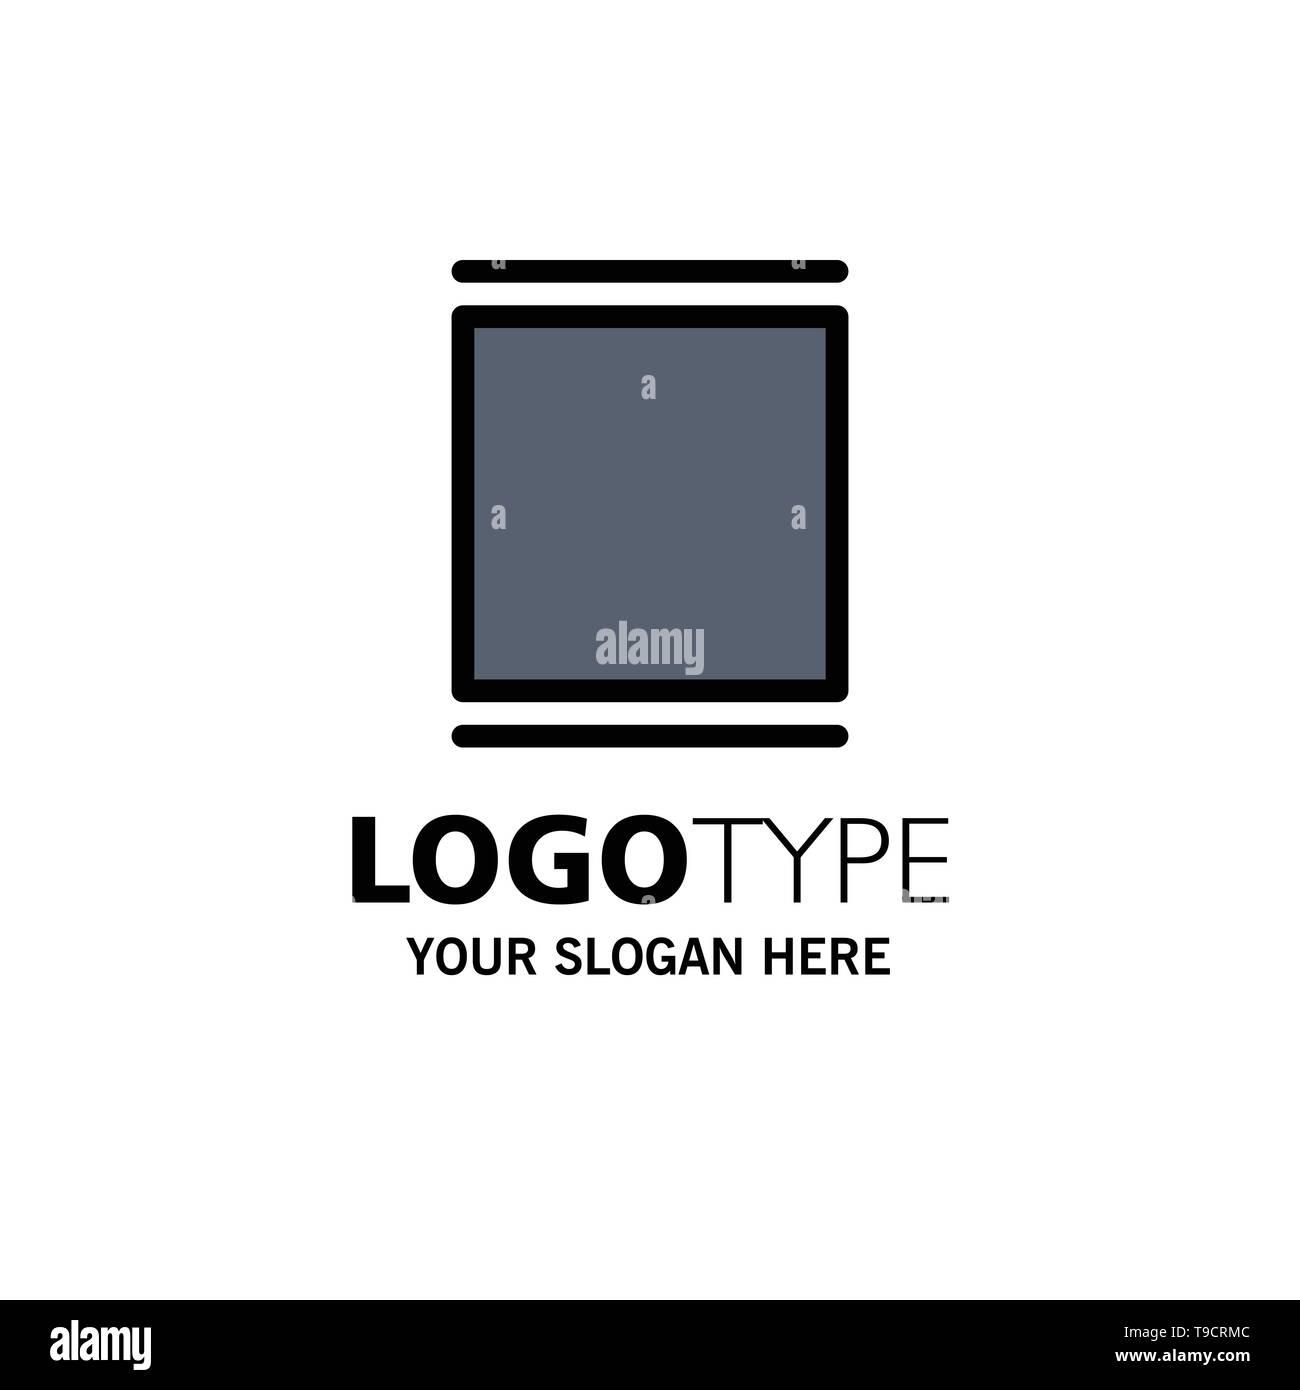 Gallery, Instagram, Sets, Timeline Business Logo Template. Flat Color - Stock Image